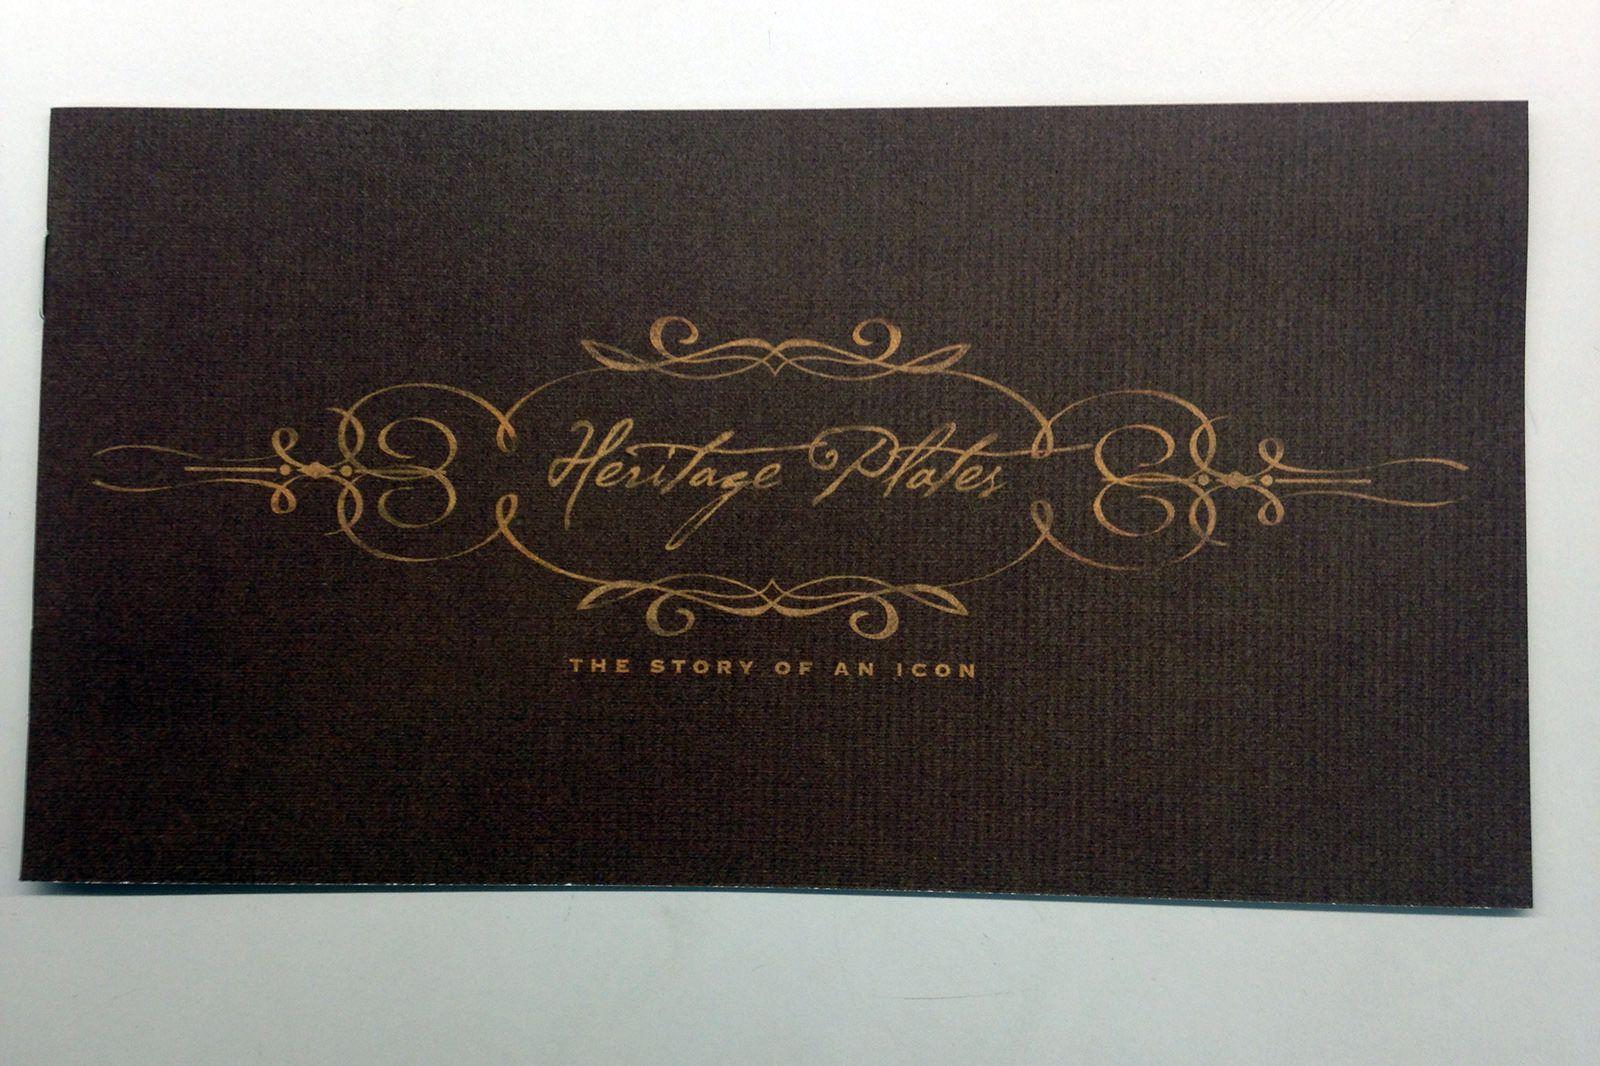 Victorian Heritage Plates